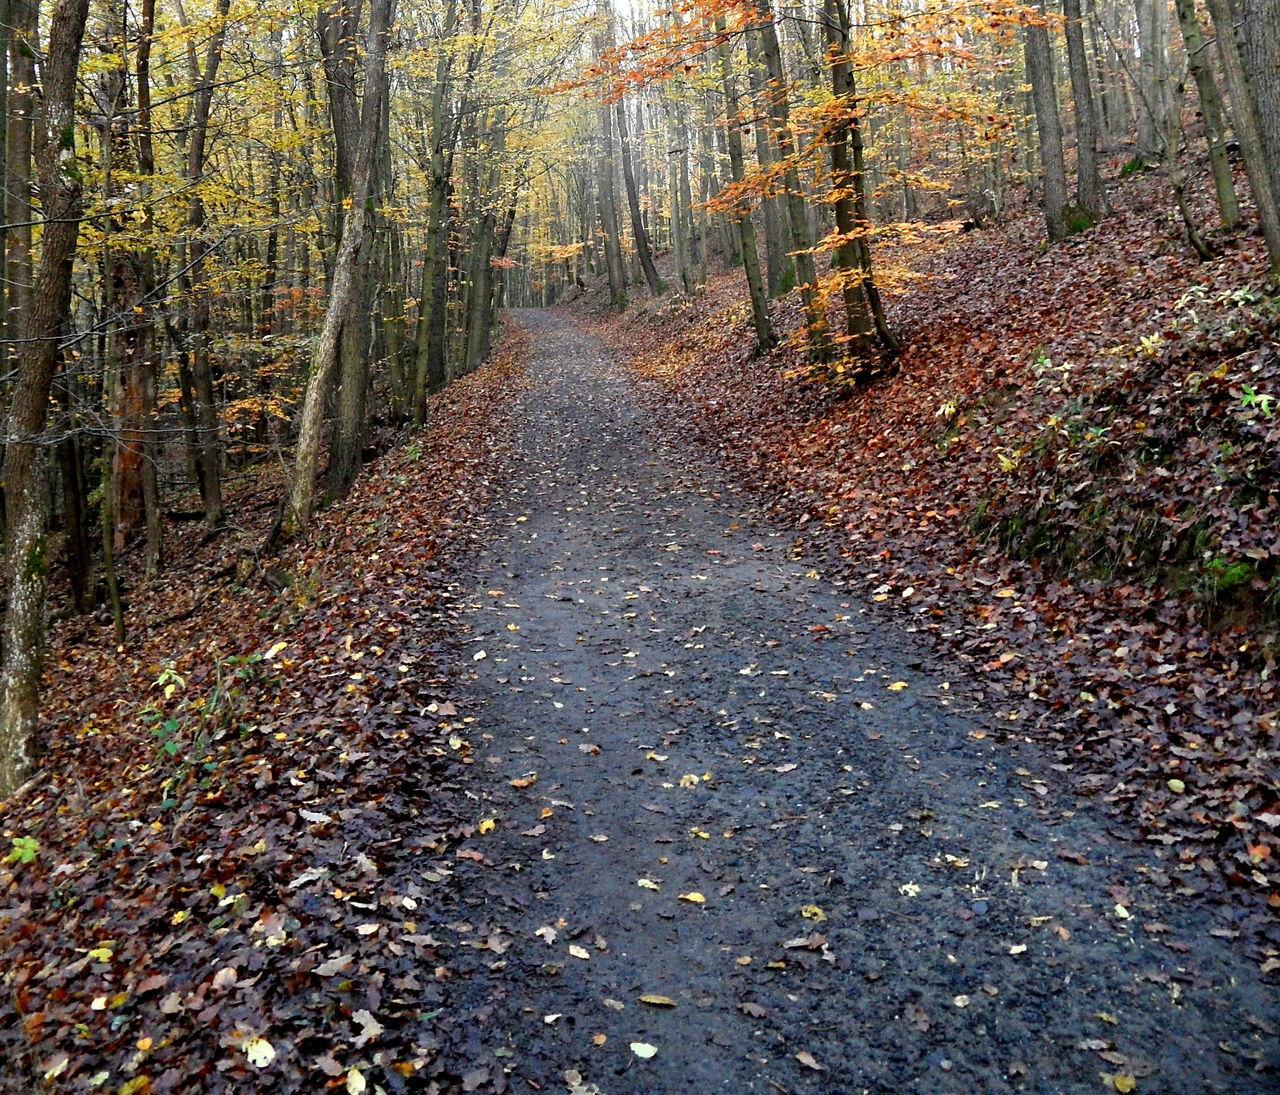 Autumn Bükk Footpath Forest Nature Outdoors Tree Trees Way First Eyeem Photo